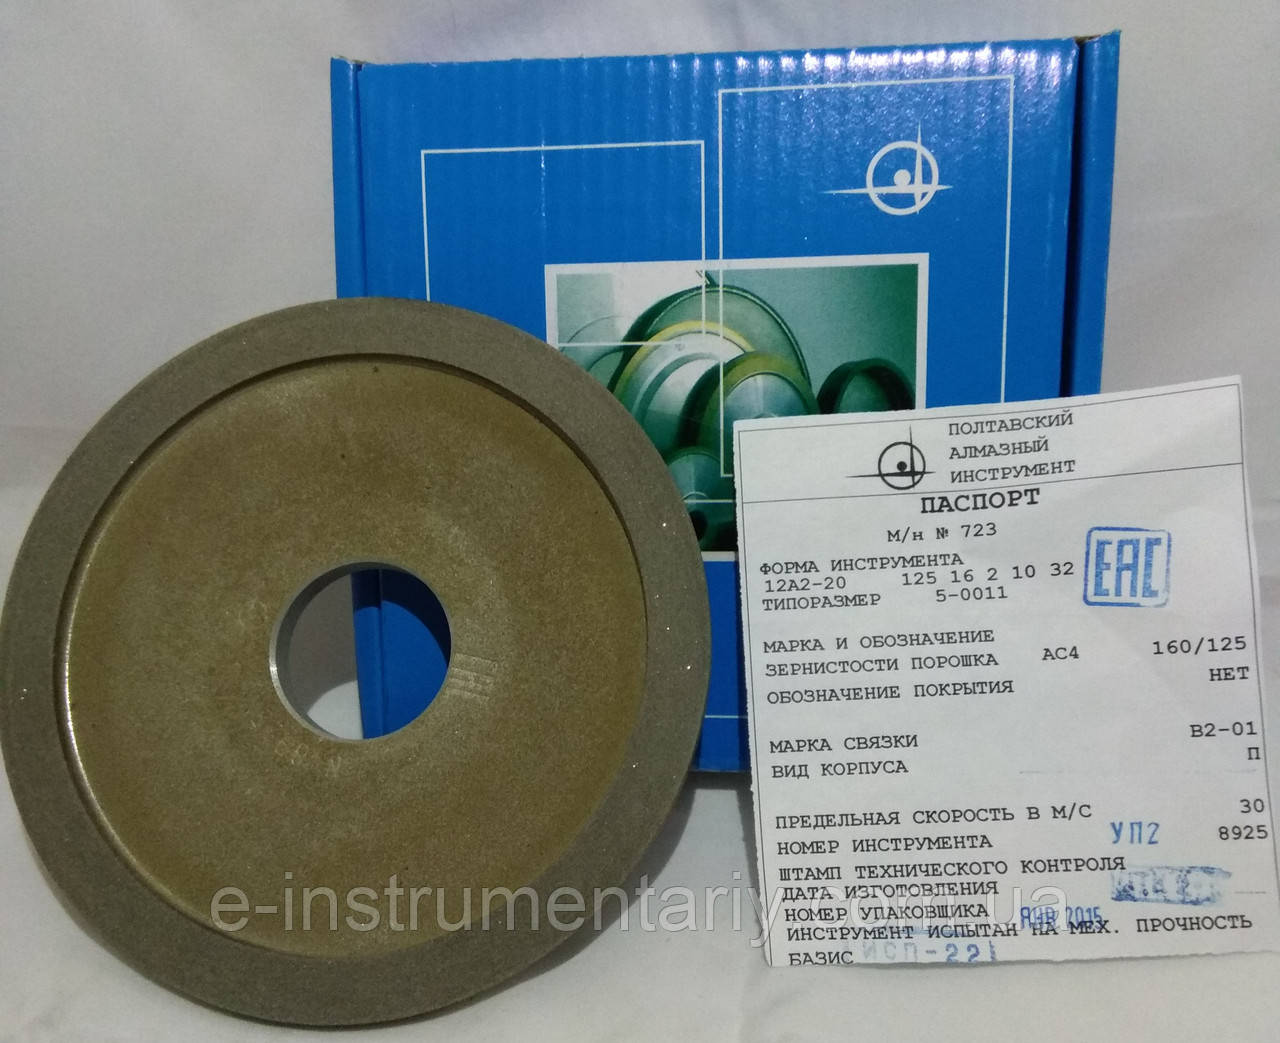 Круг алмазный  Тарелка(12А2-20) 125х10х2х16х32 100% АС4 Связка В2-01